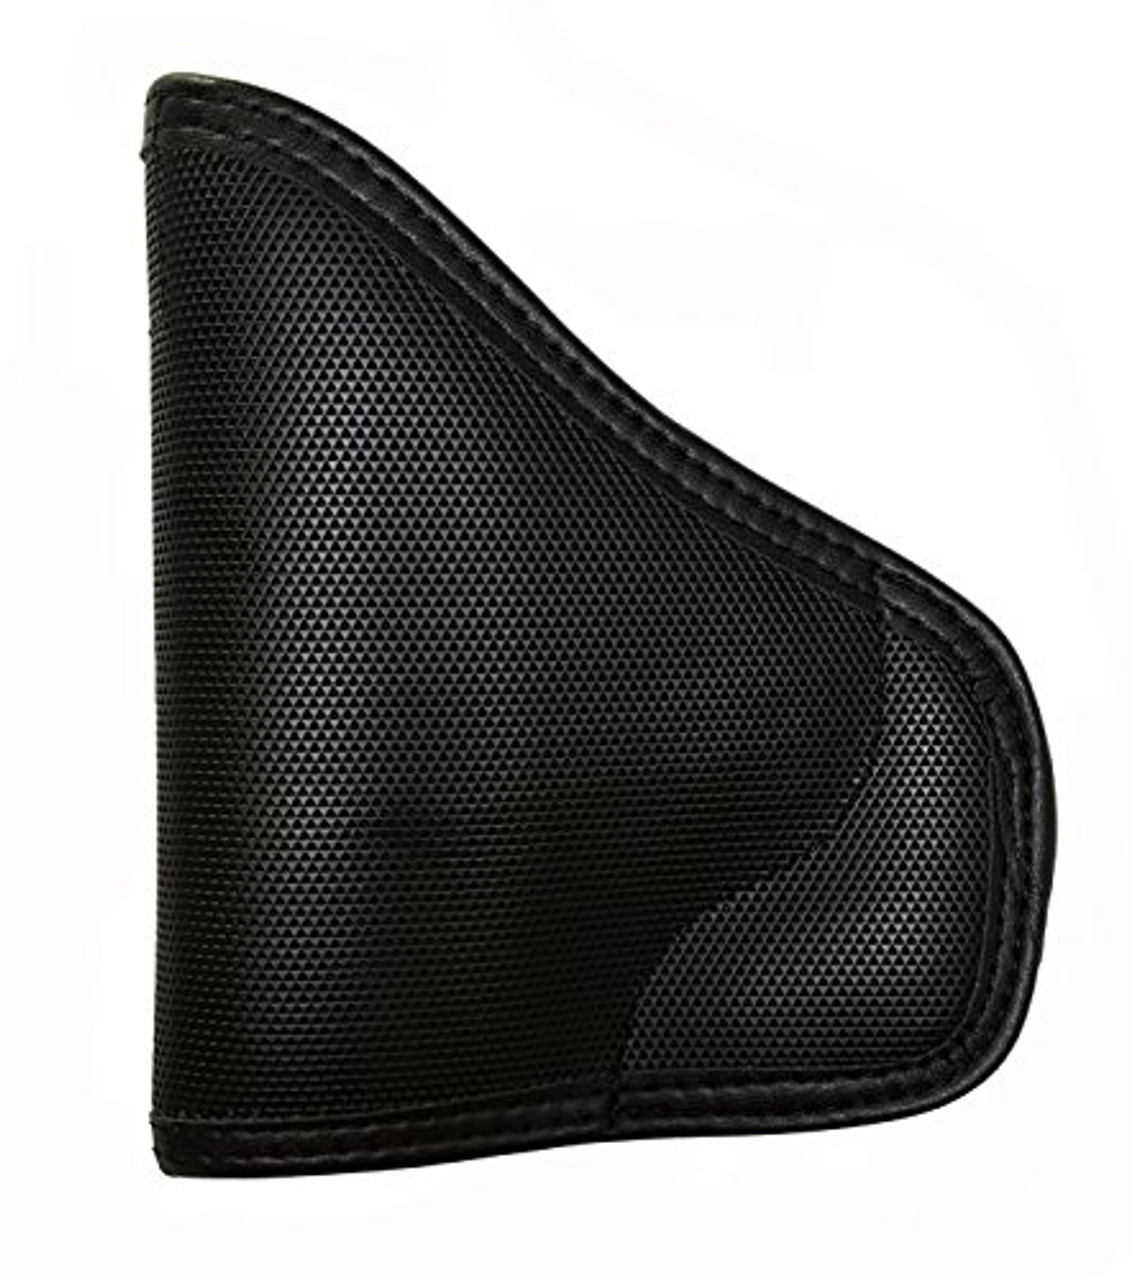 Taurus PT111 G2 Millennium Custom Fit Leather Trimmed orGUNizer Poly Pocket  Holster For Concealed Carry Comfort by Garrison Grip (D)